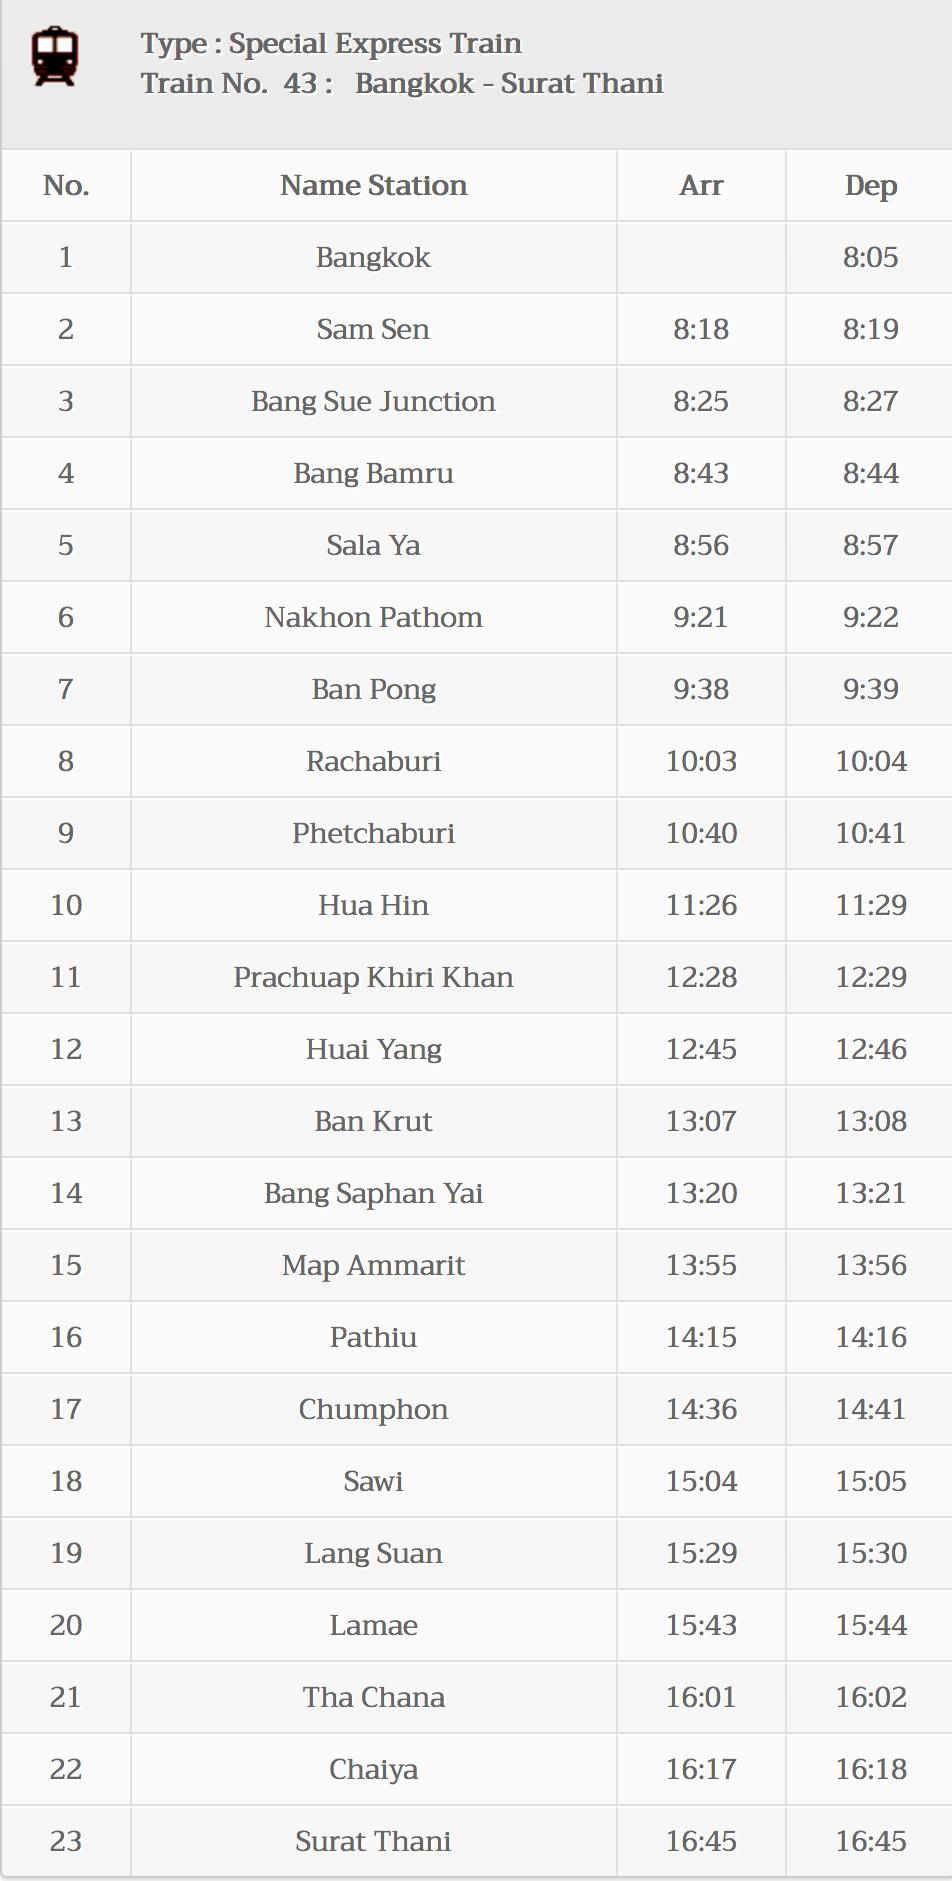 train-43-bangkok-to-surat-thani-timetable.png